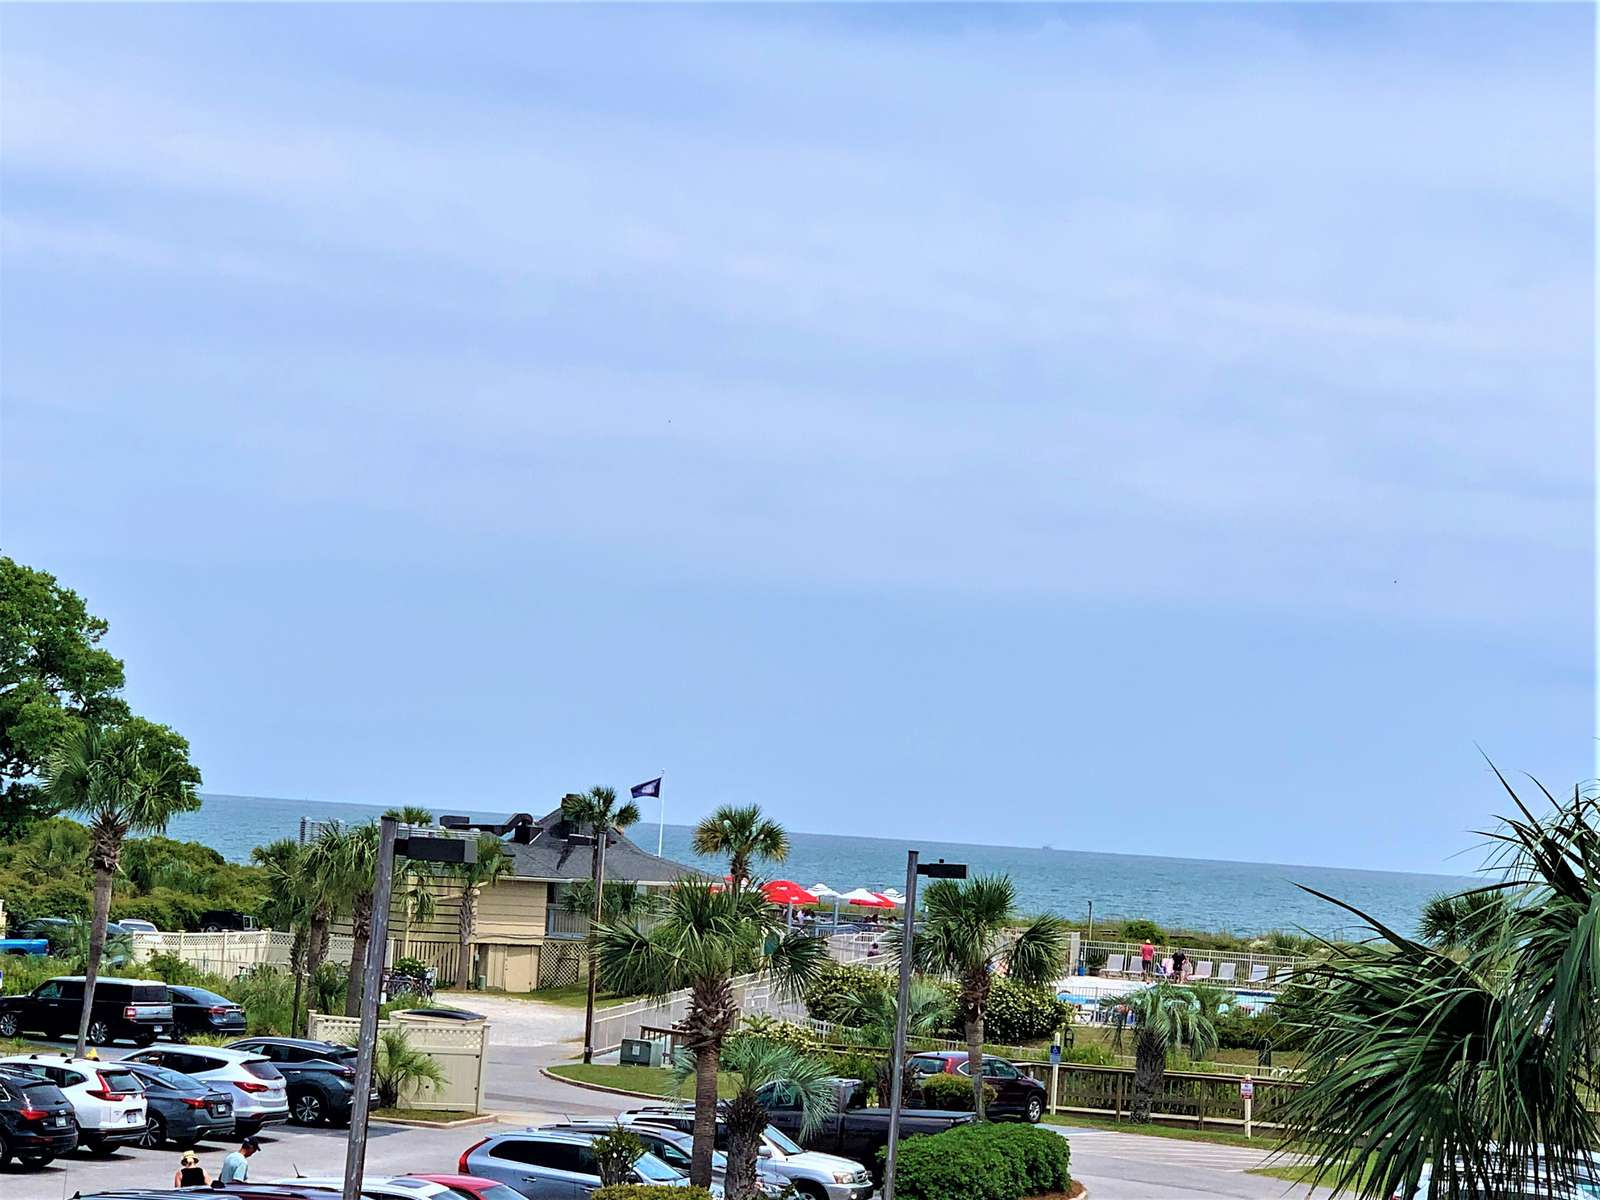 Ocean Villa B-213 Hilton Head Beach and Tennis Resort - property